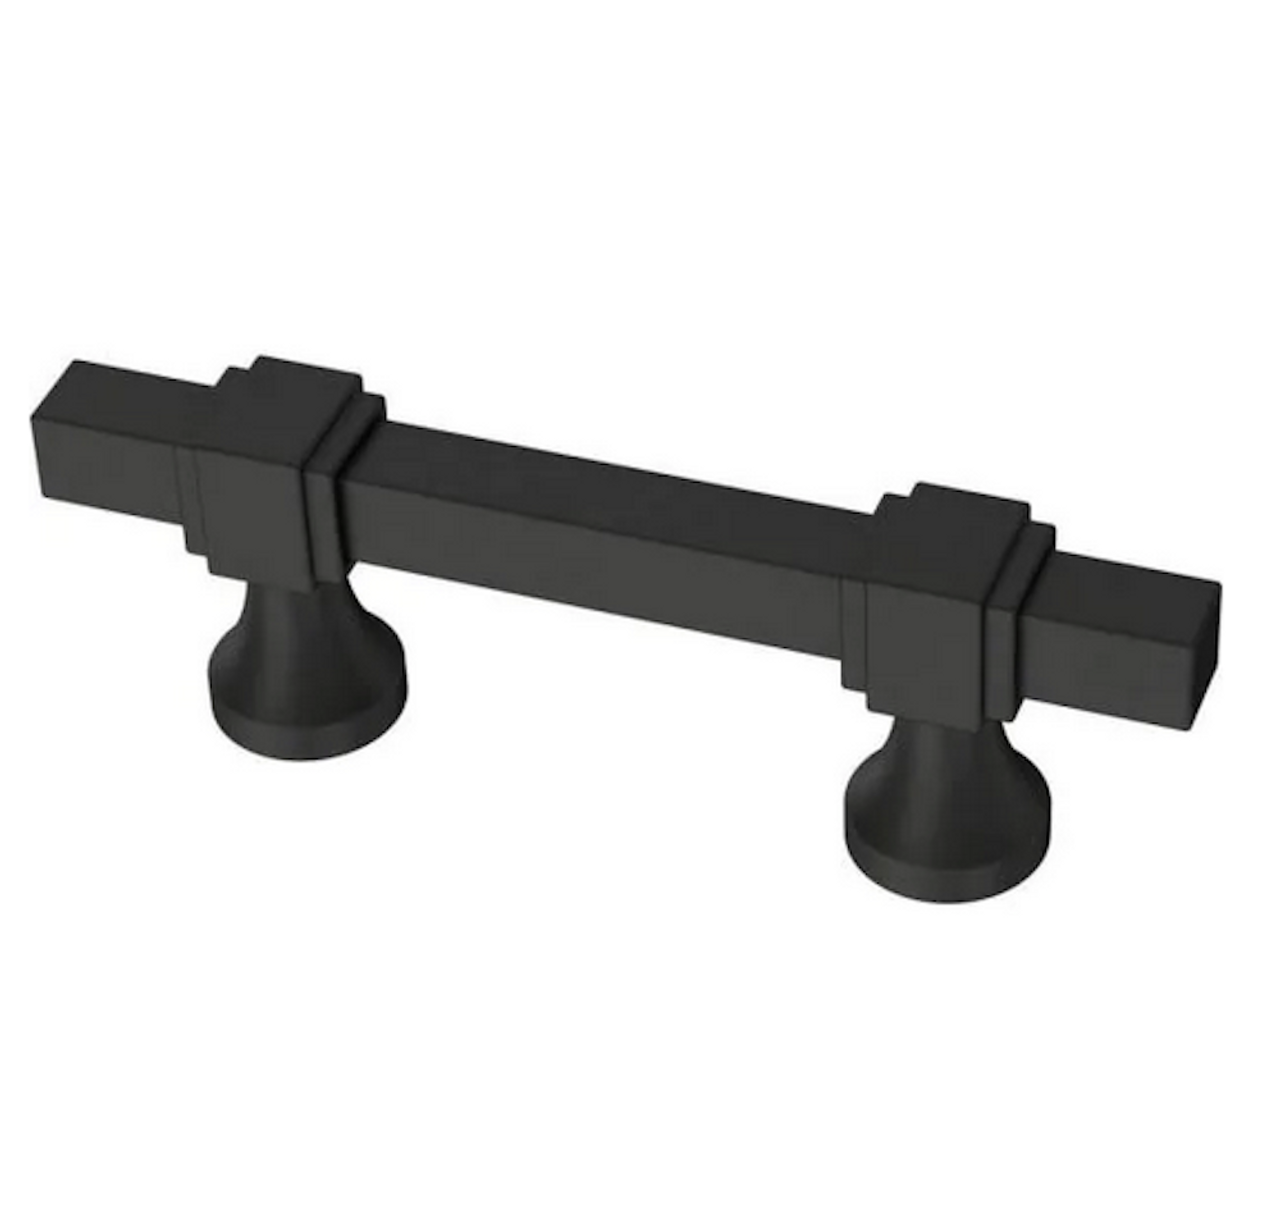 "Liberty P44379C-FB 1 3/8"" - 4"" Stepped Square Adjustable Cabinet Pull Flat Black"